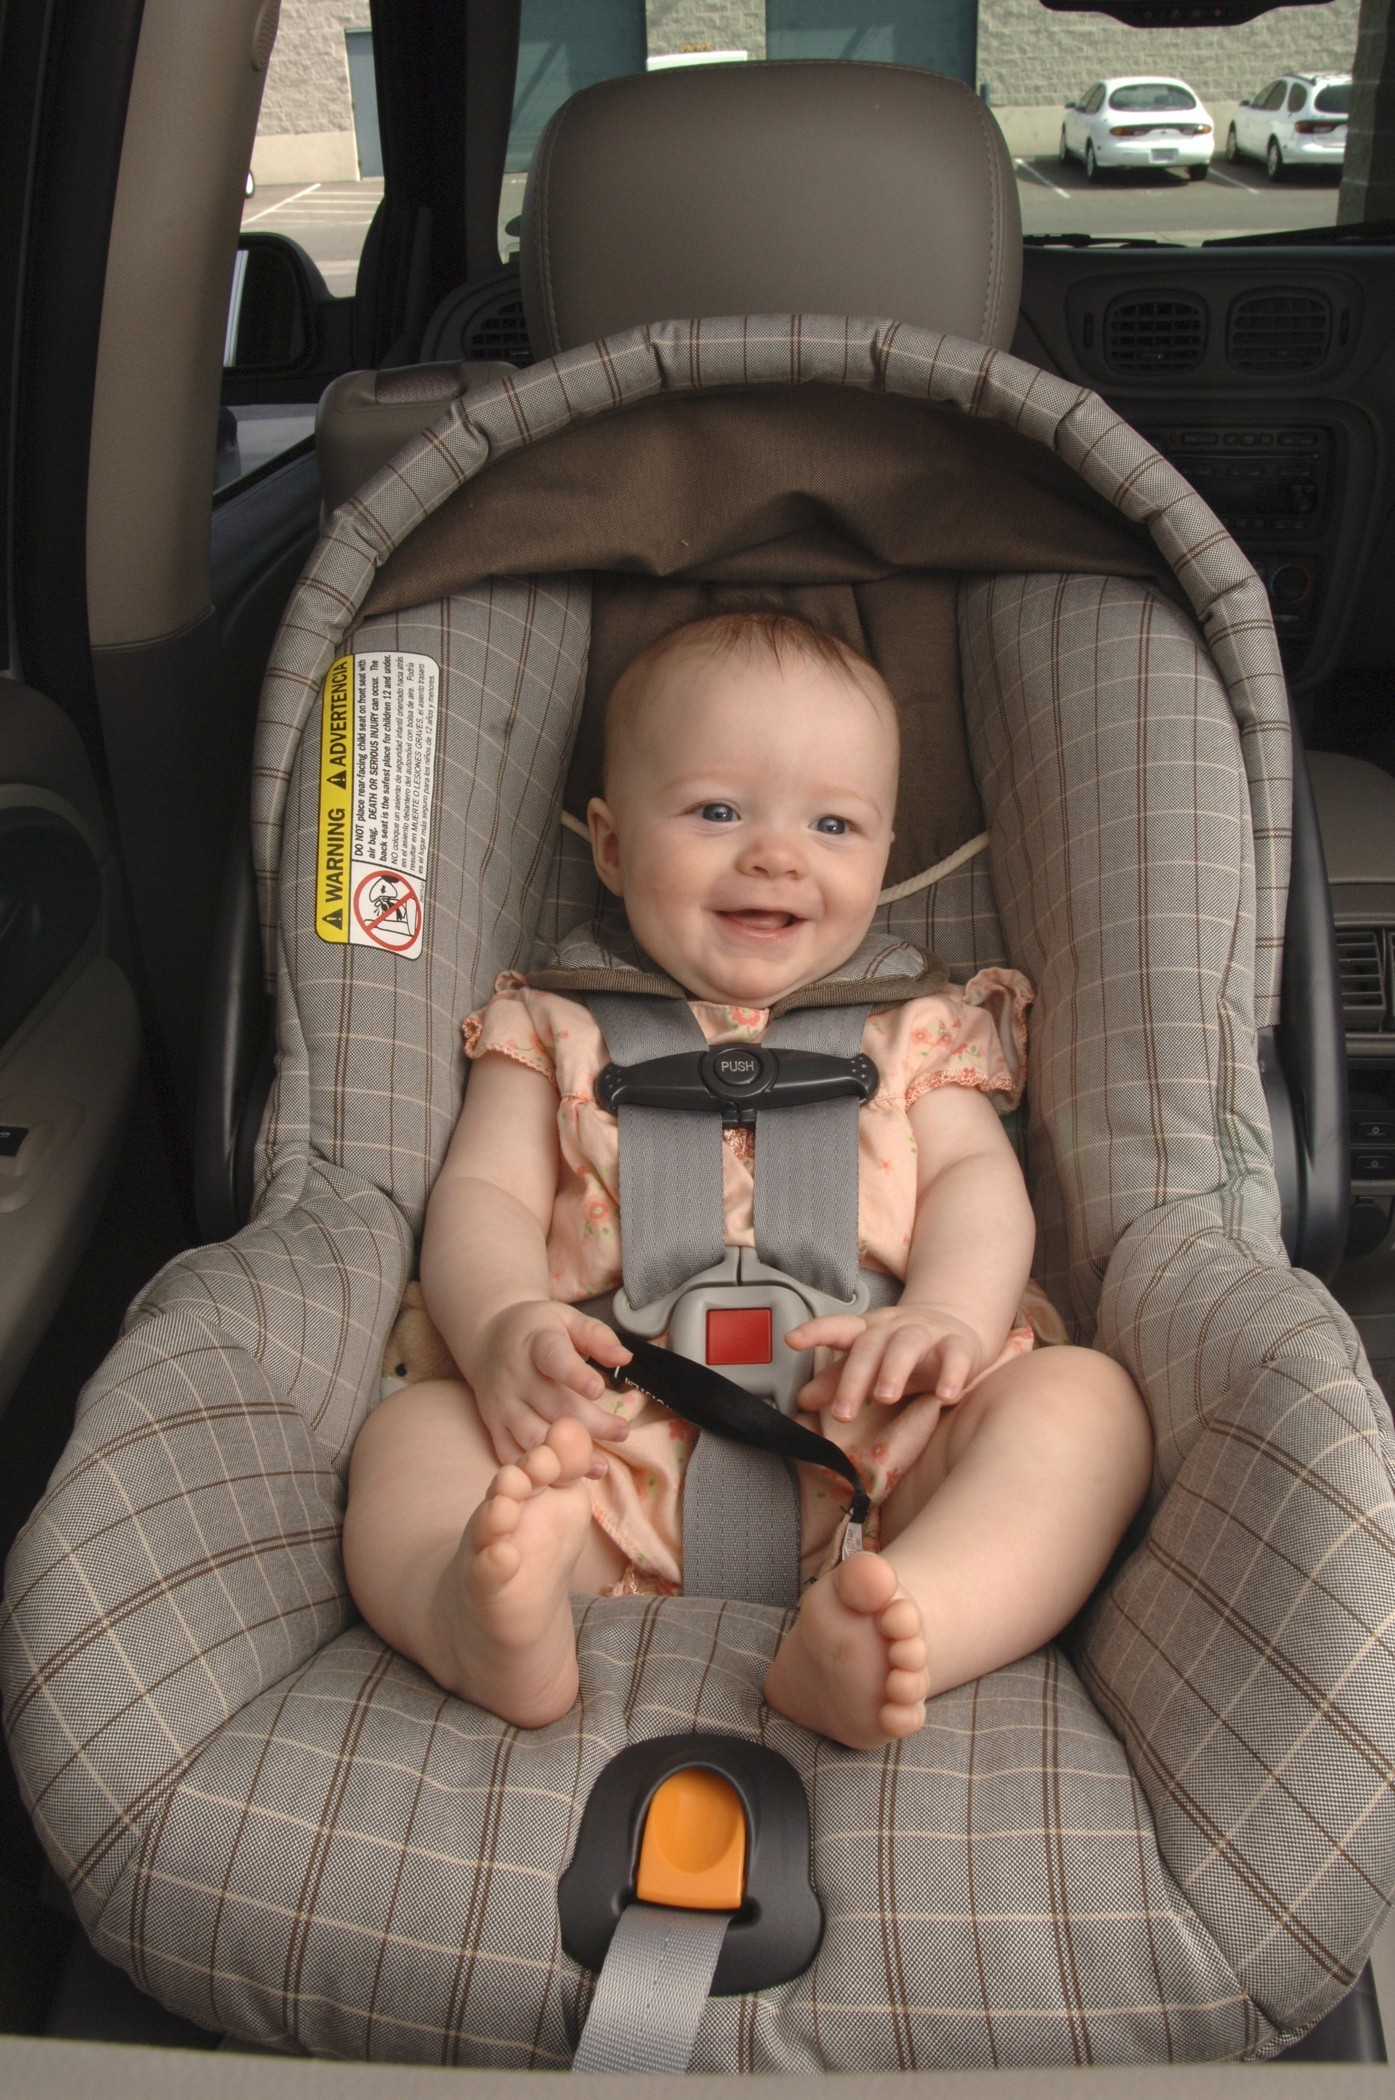 Child Safety Seat Distribution